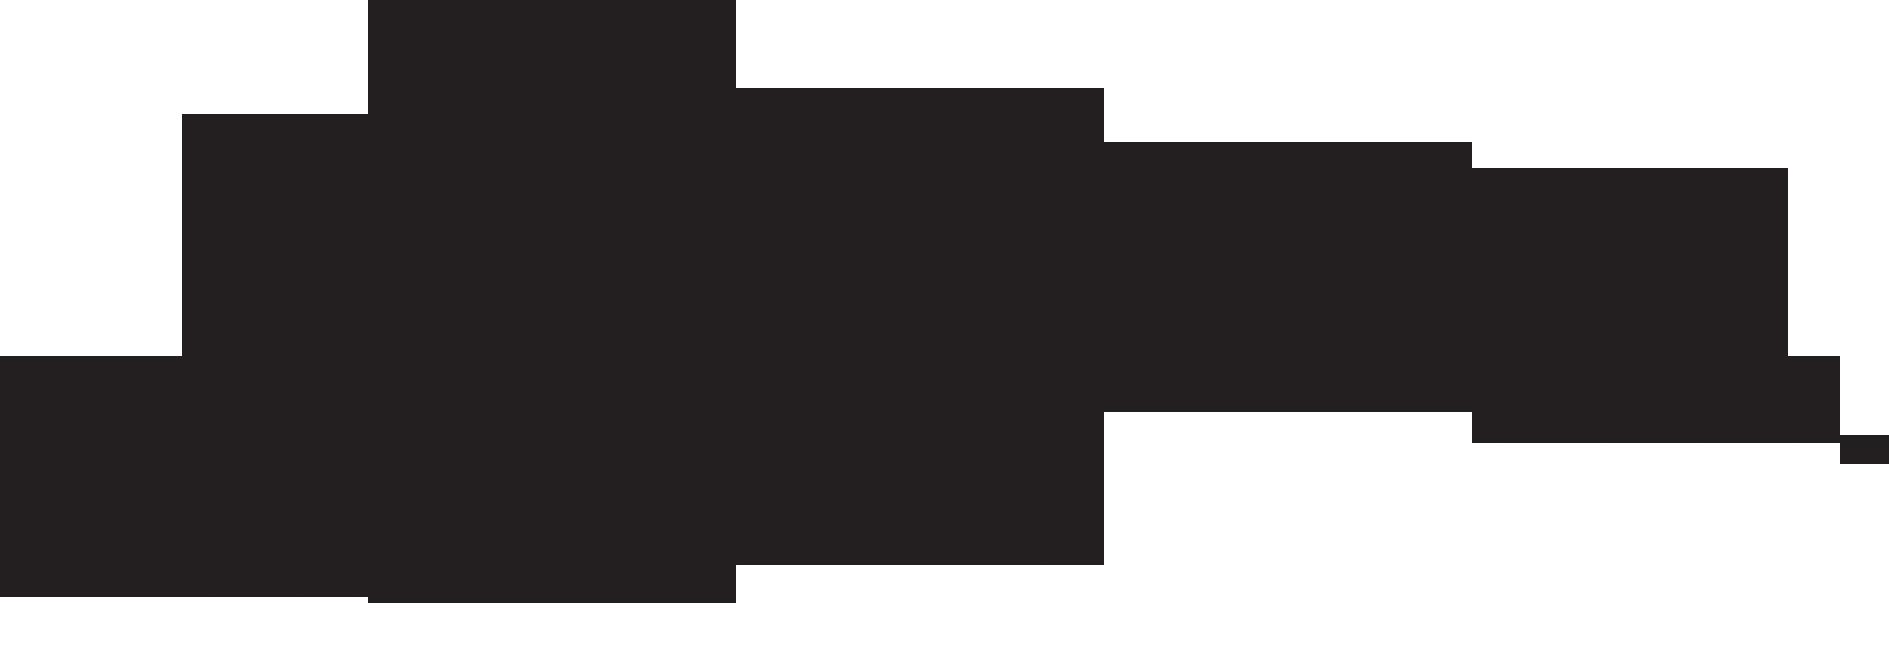 Boatsauna - Paadisaun